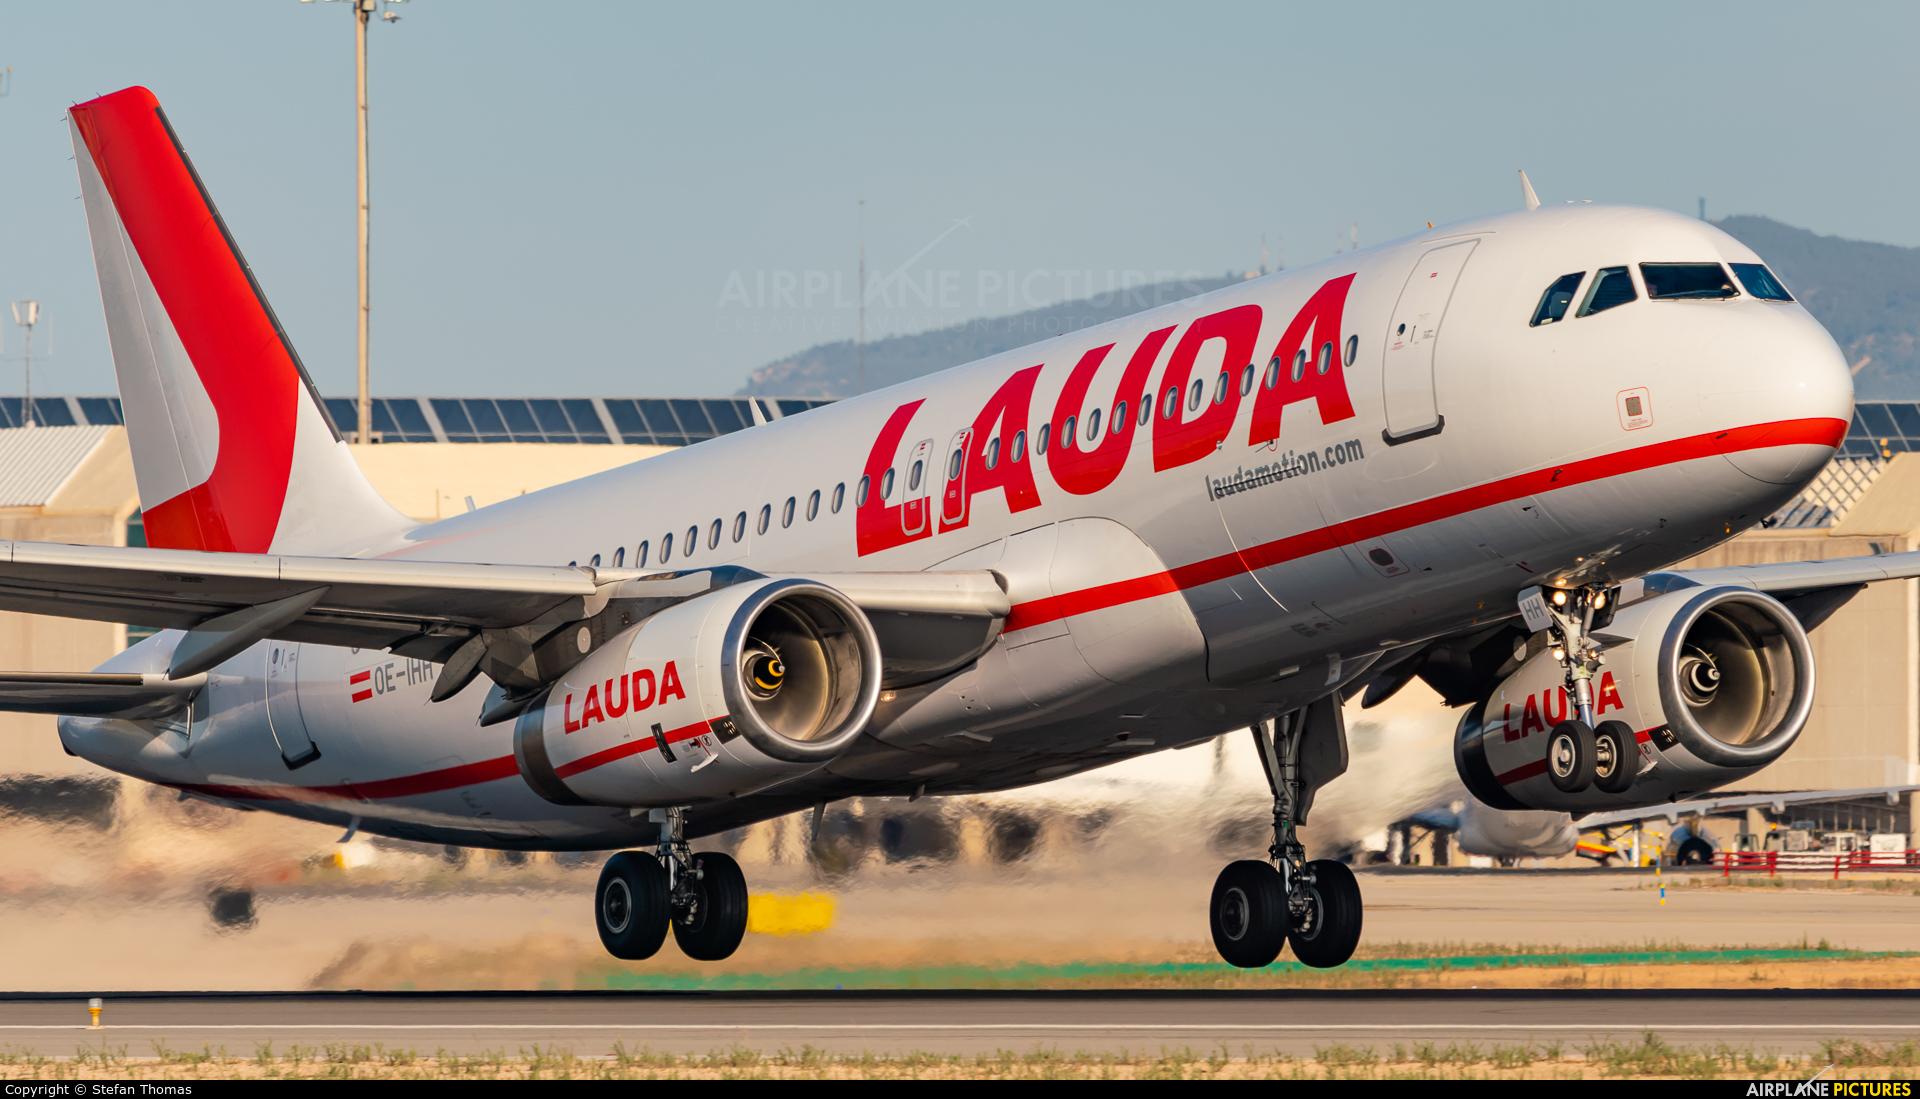 LaudaMotion OE-IHH aircraft at Palma de Mallorca